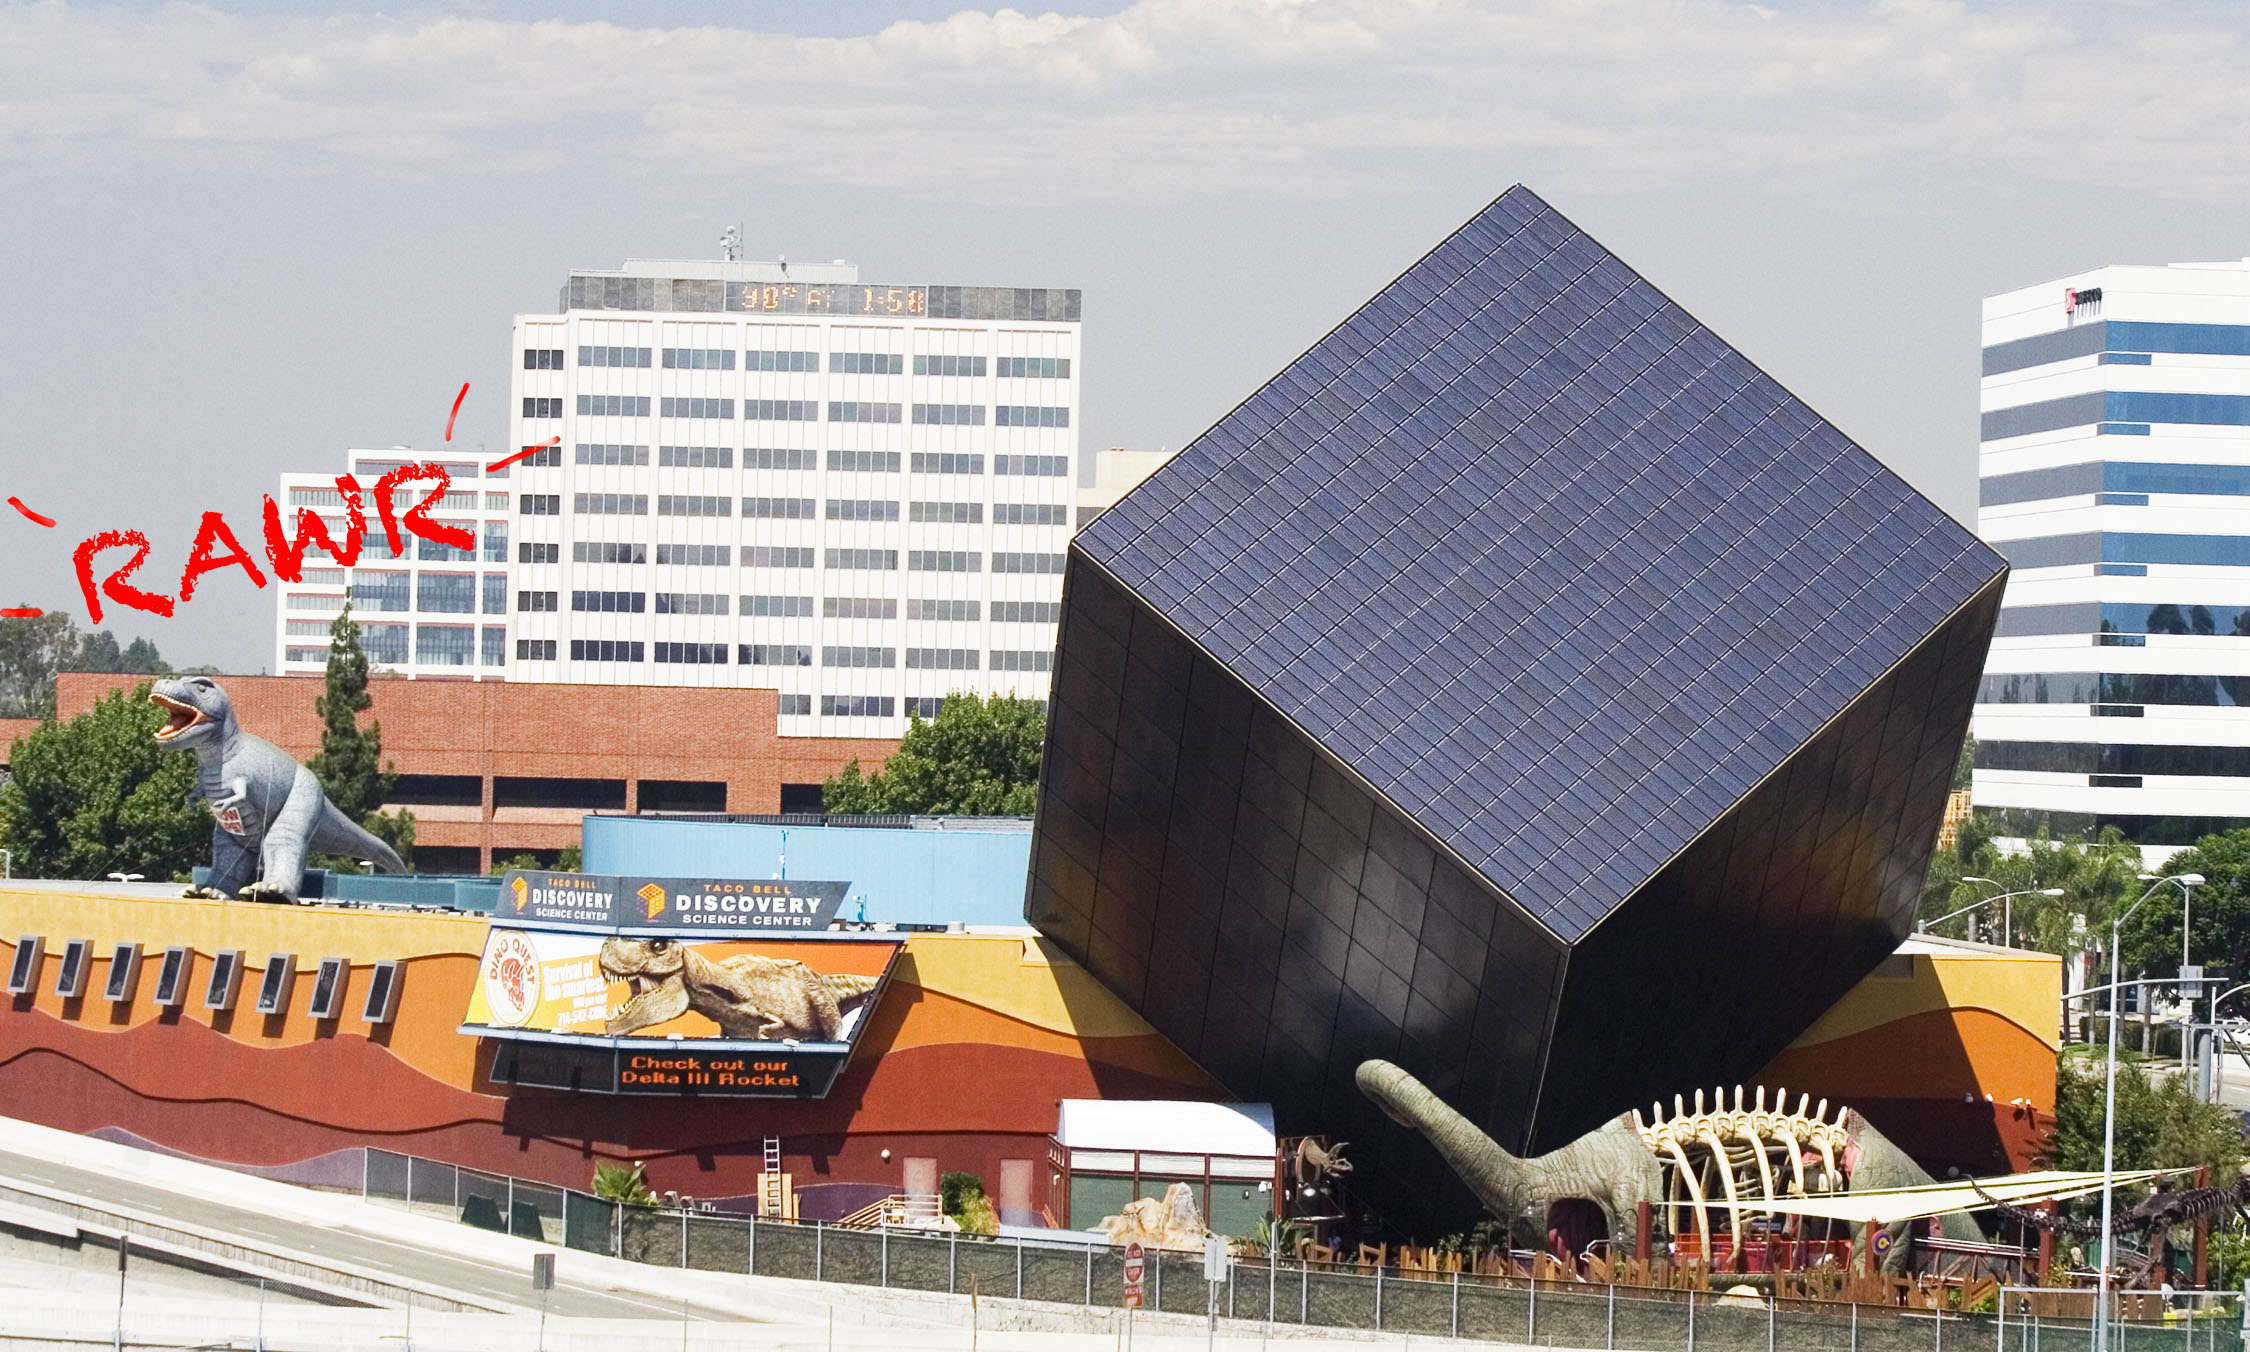 giant-inflatable-dinosaur-rooftop-museum.jpg